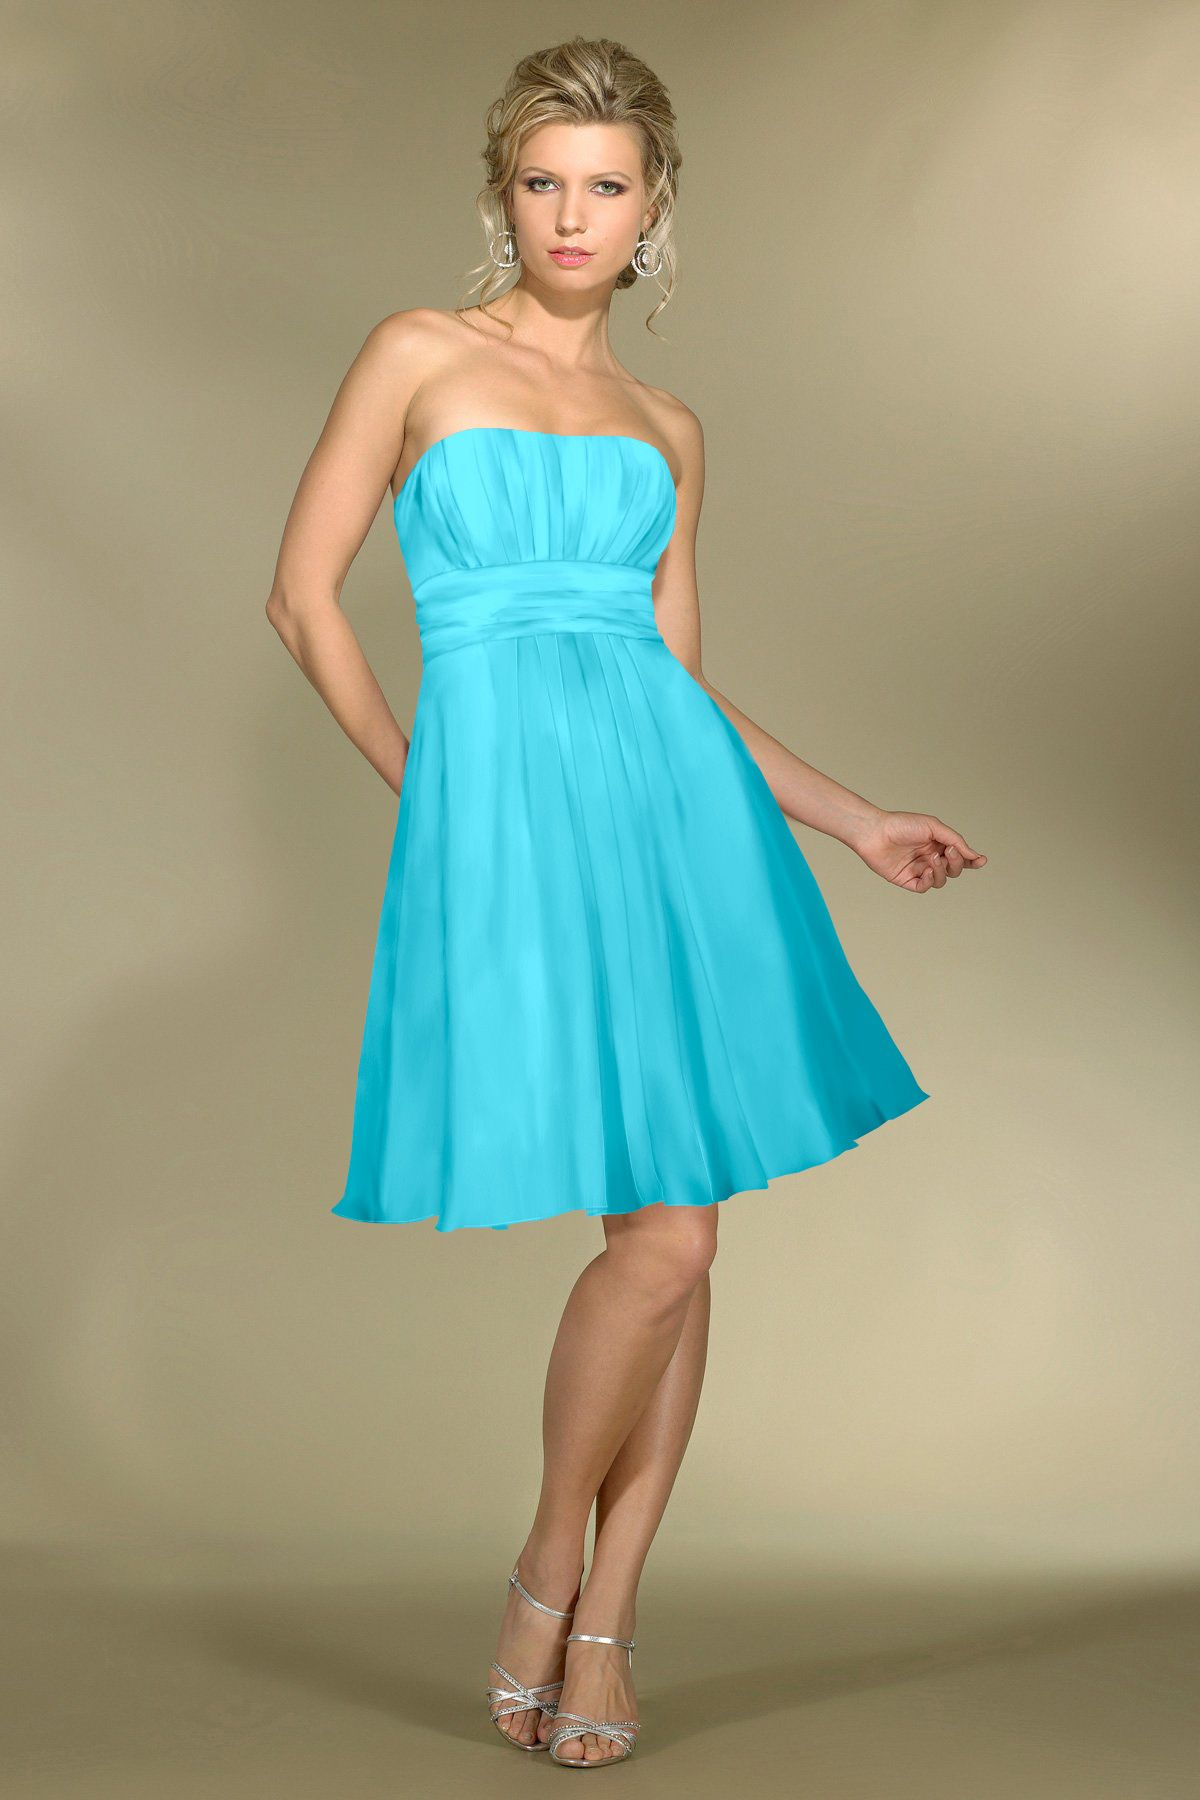 Chiffon gatheredstrapless style c bridesmaid dress by alexia